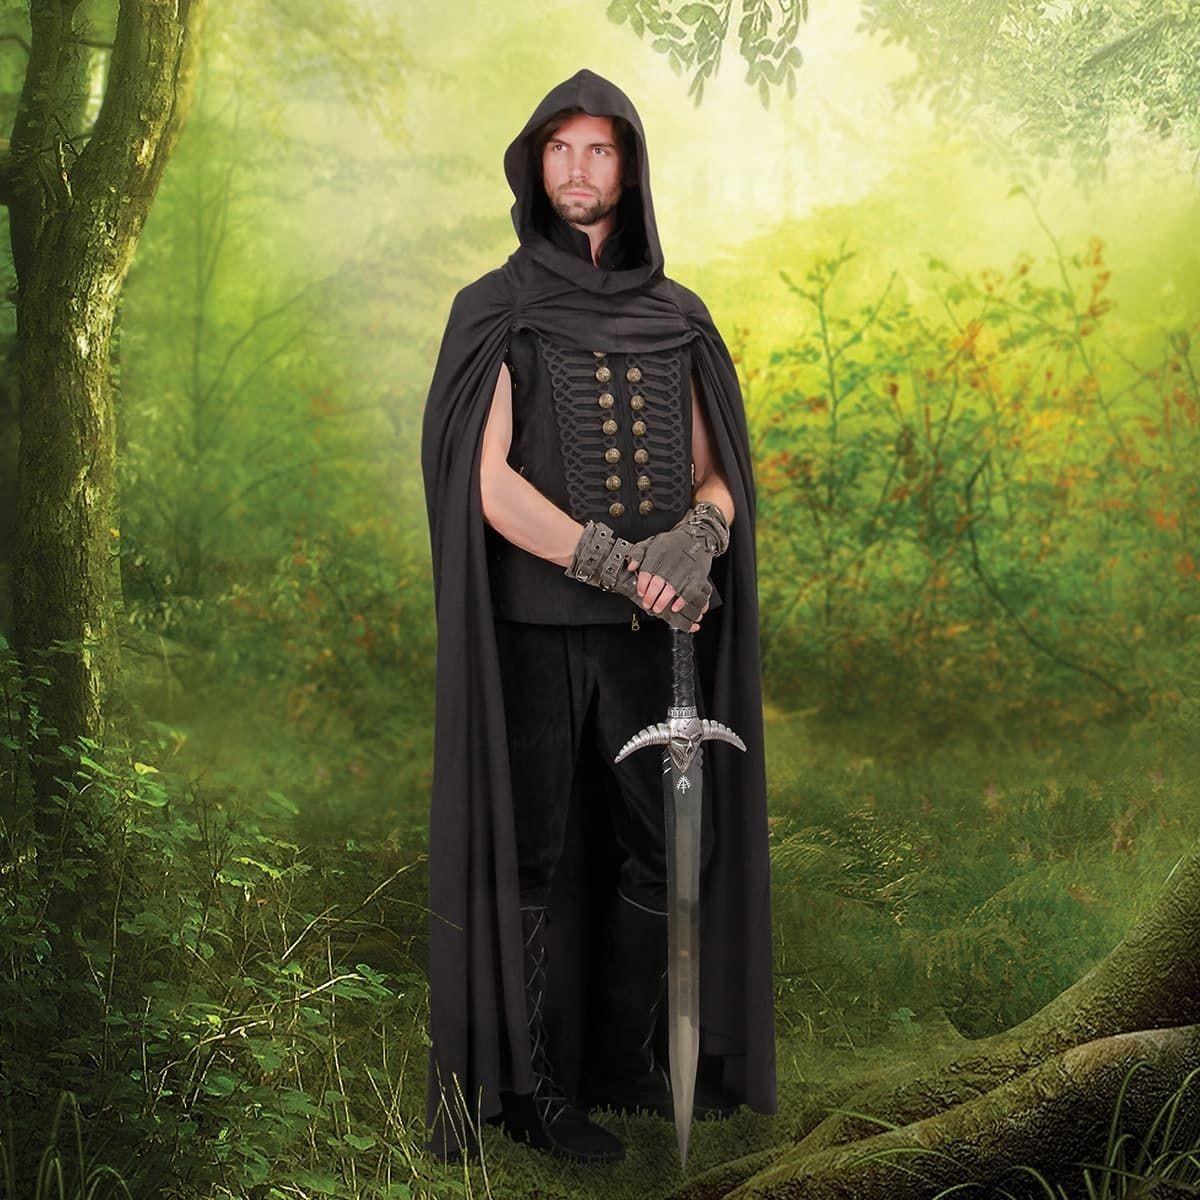 Black Mercenary Hooded Cloak